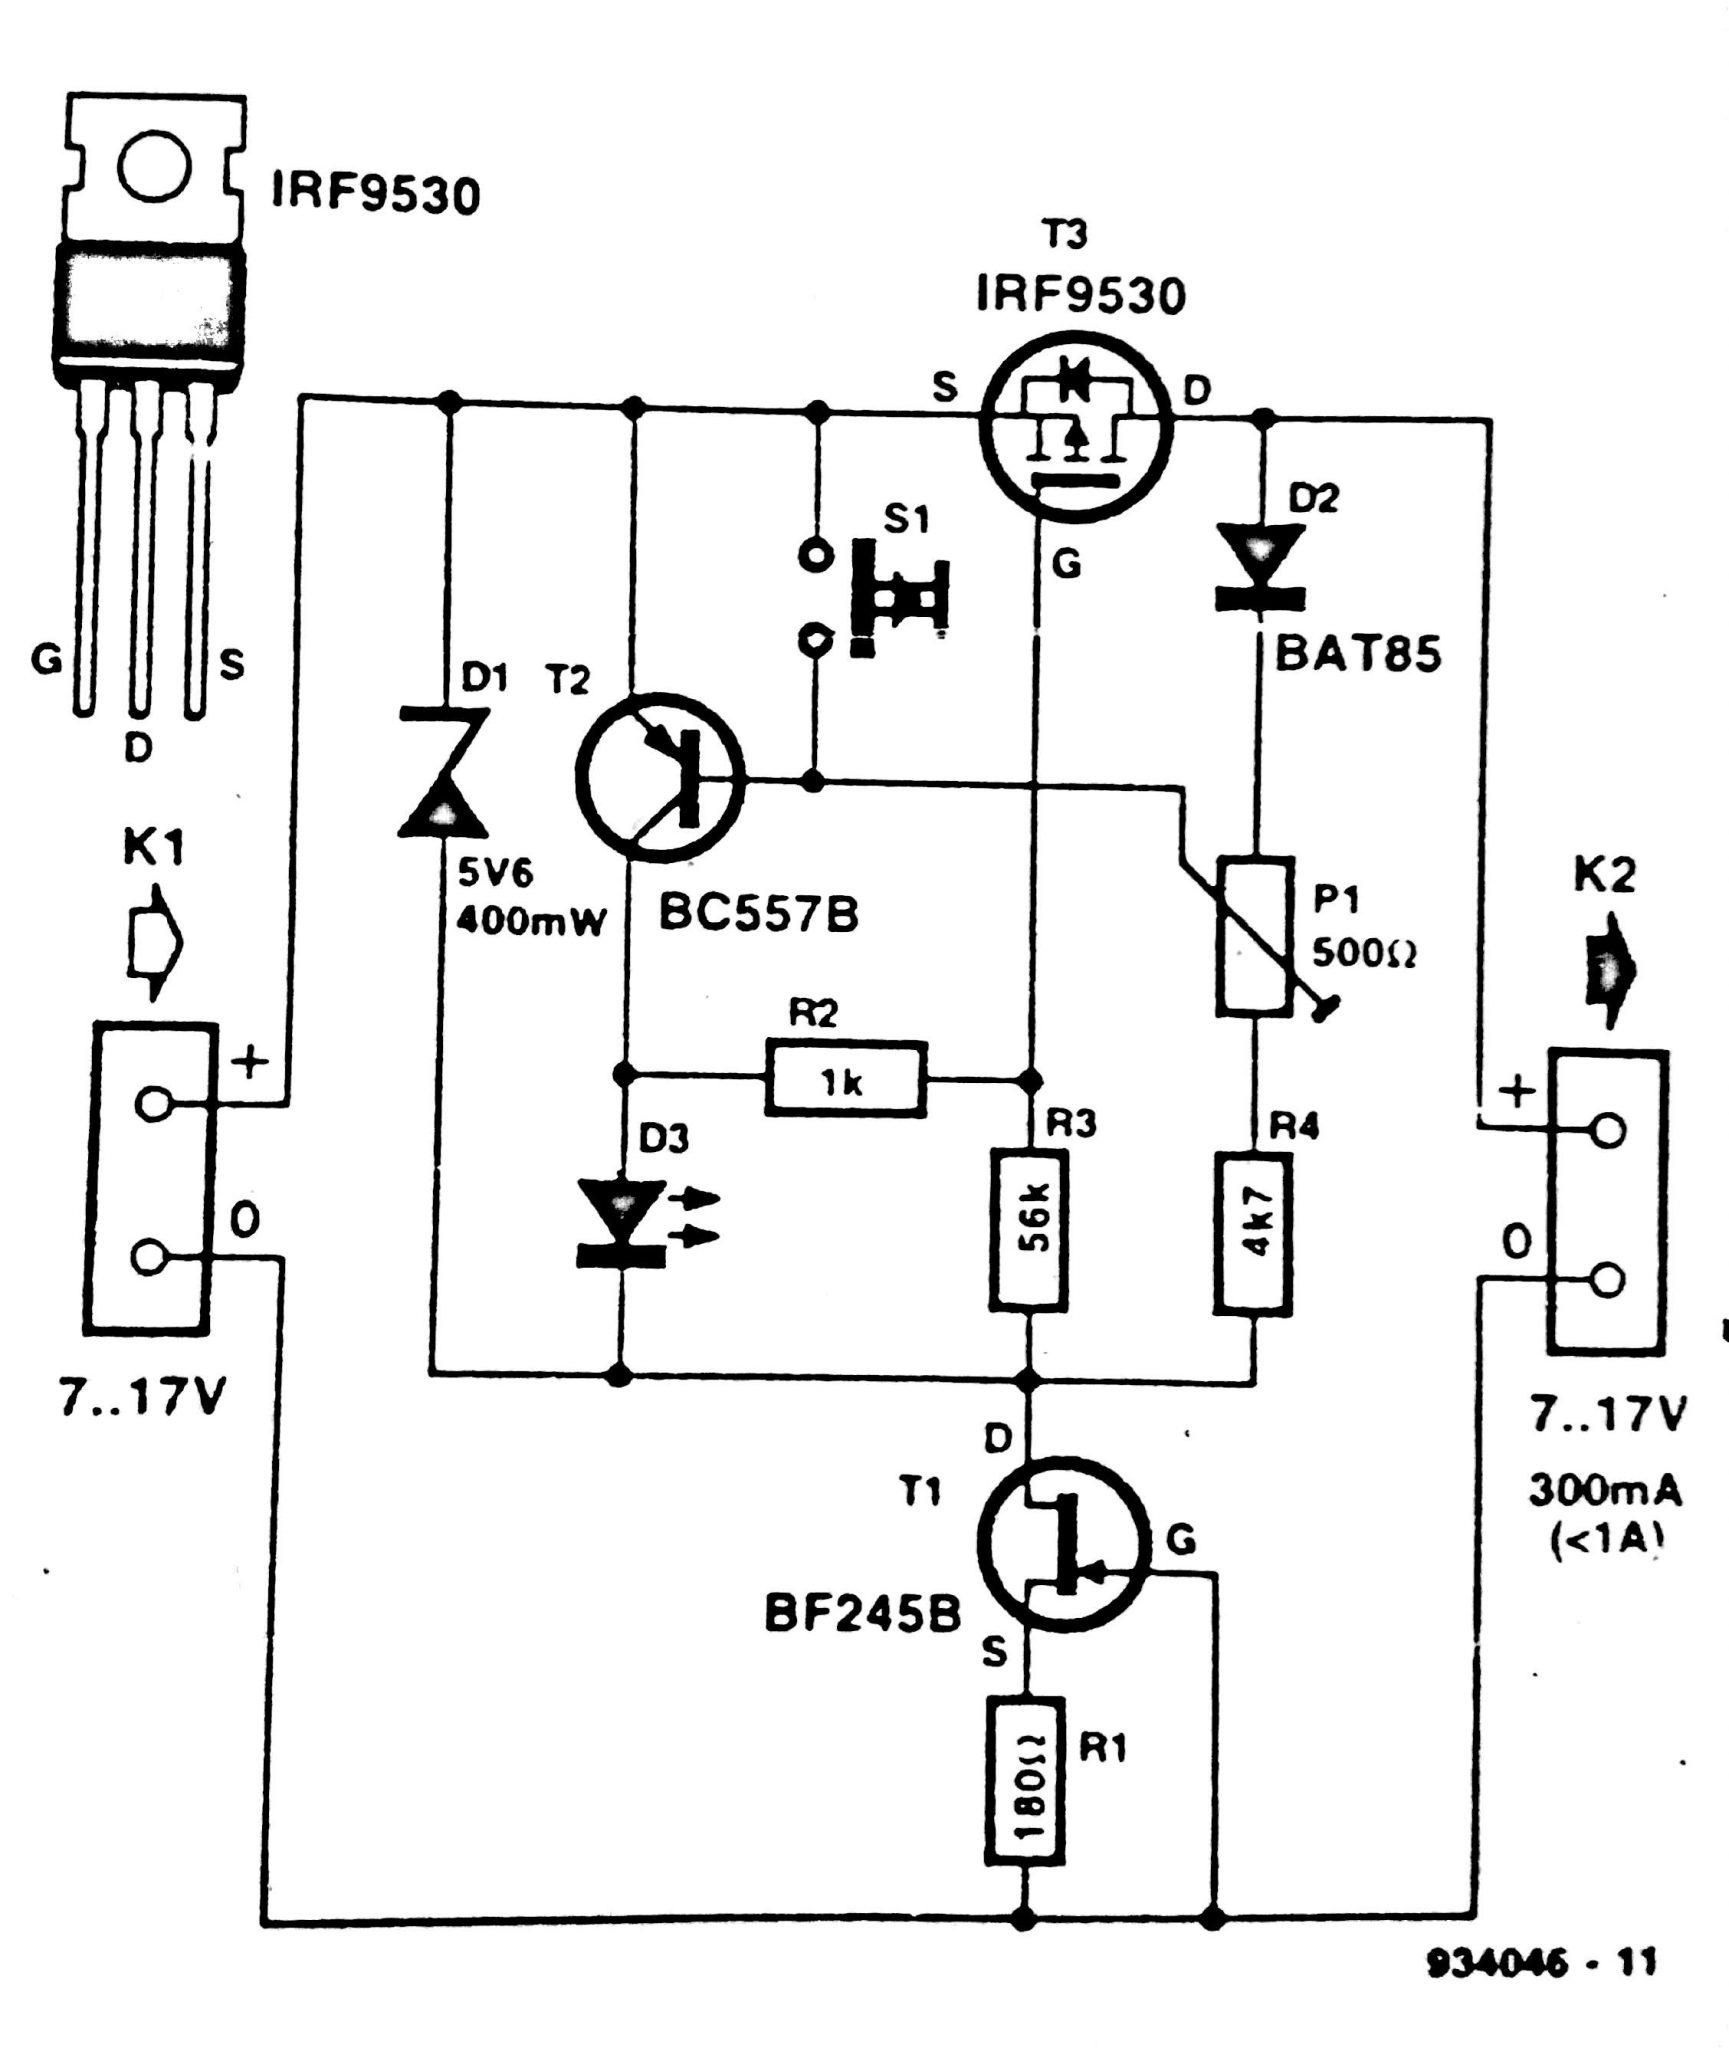 fuse line diagram data wiring diagrams \u2022 fuse symbol in single line diagram at Fuse Line Diagram